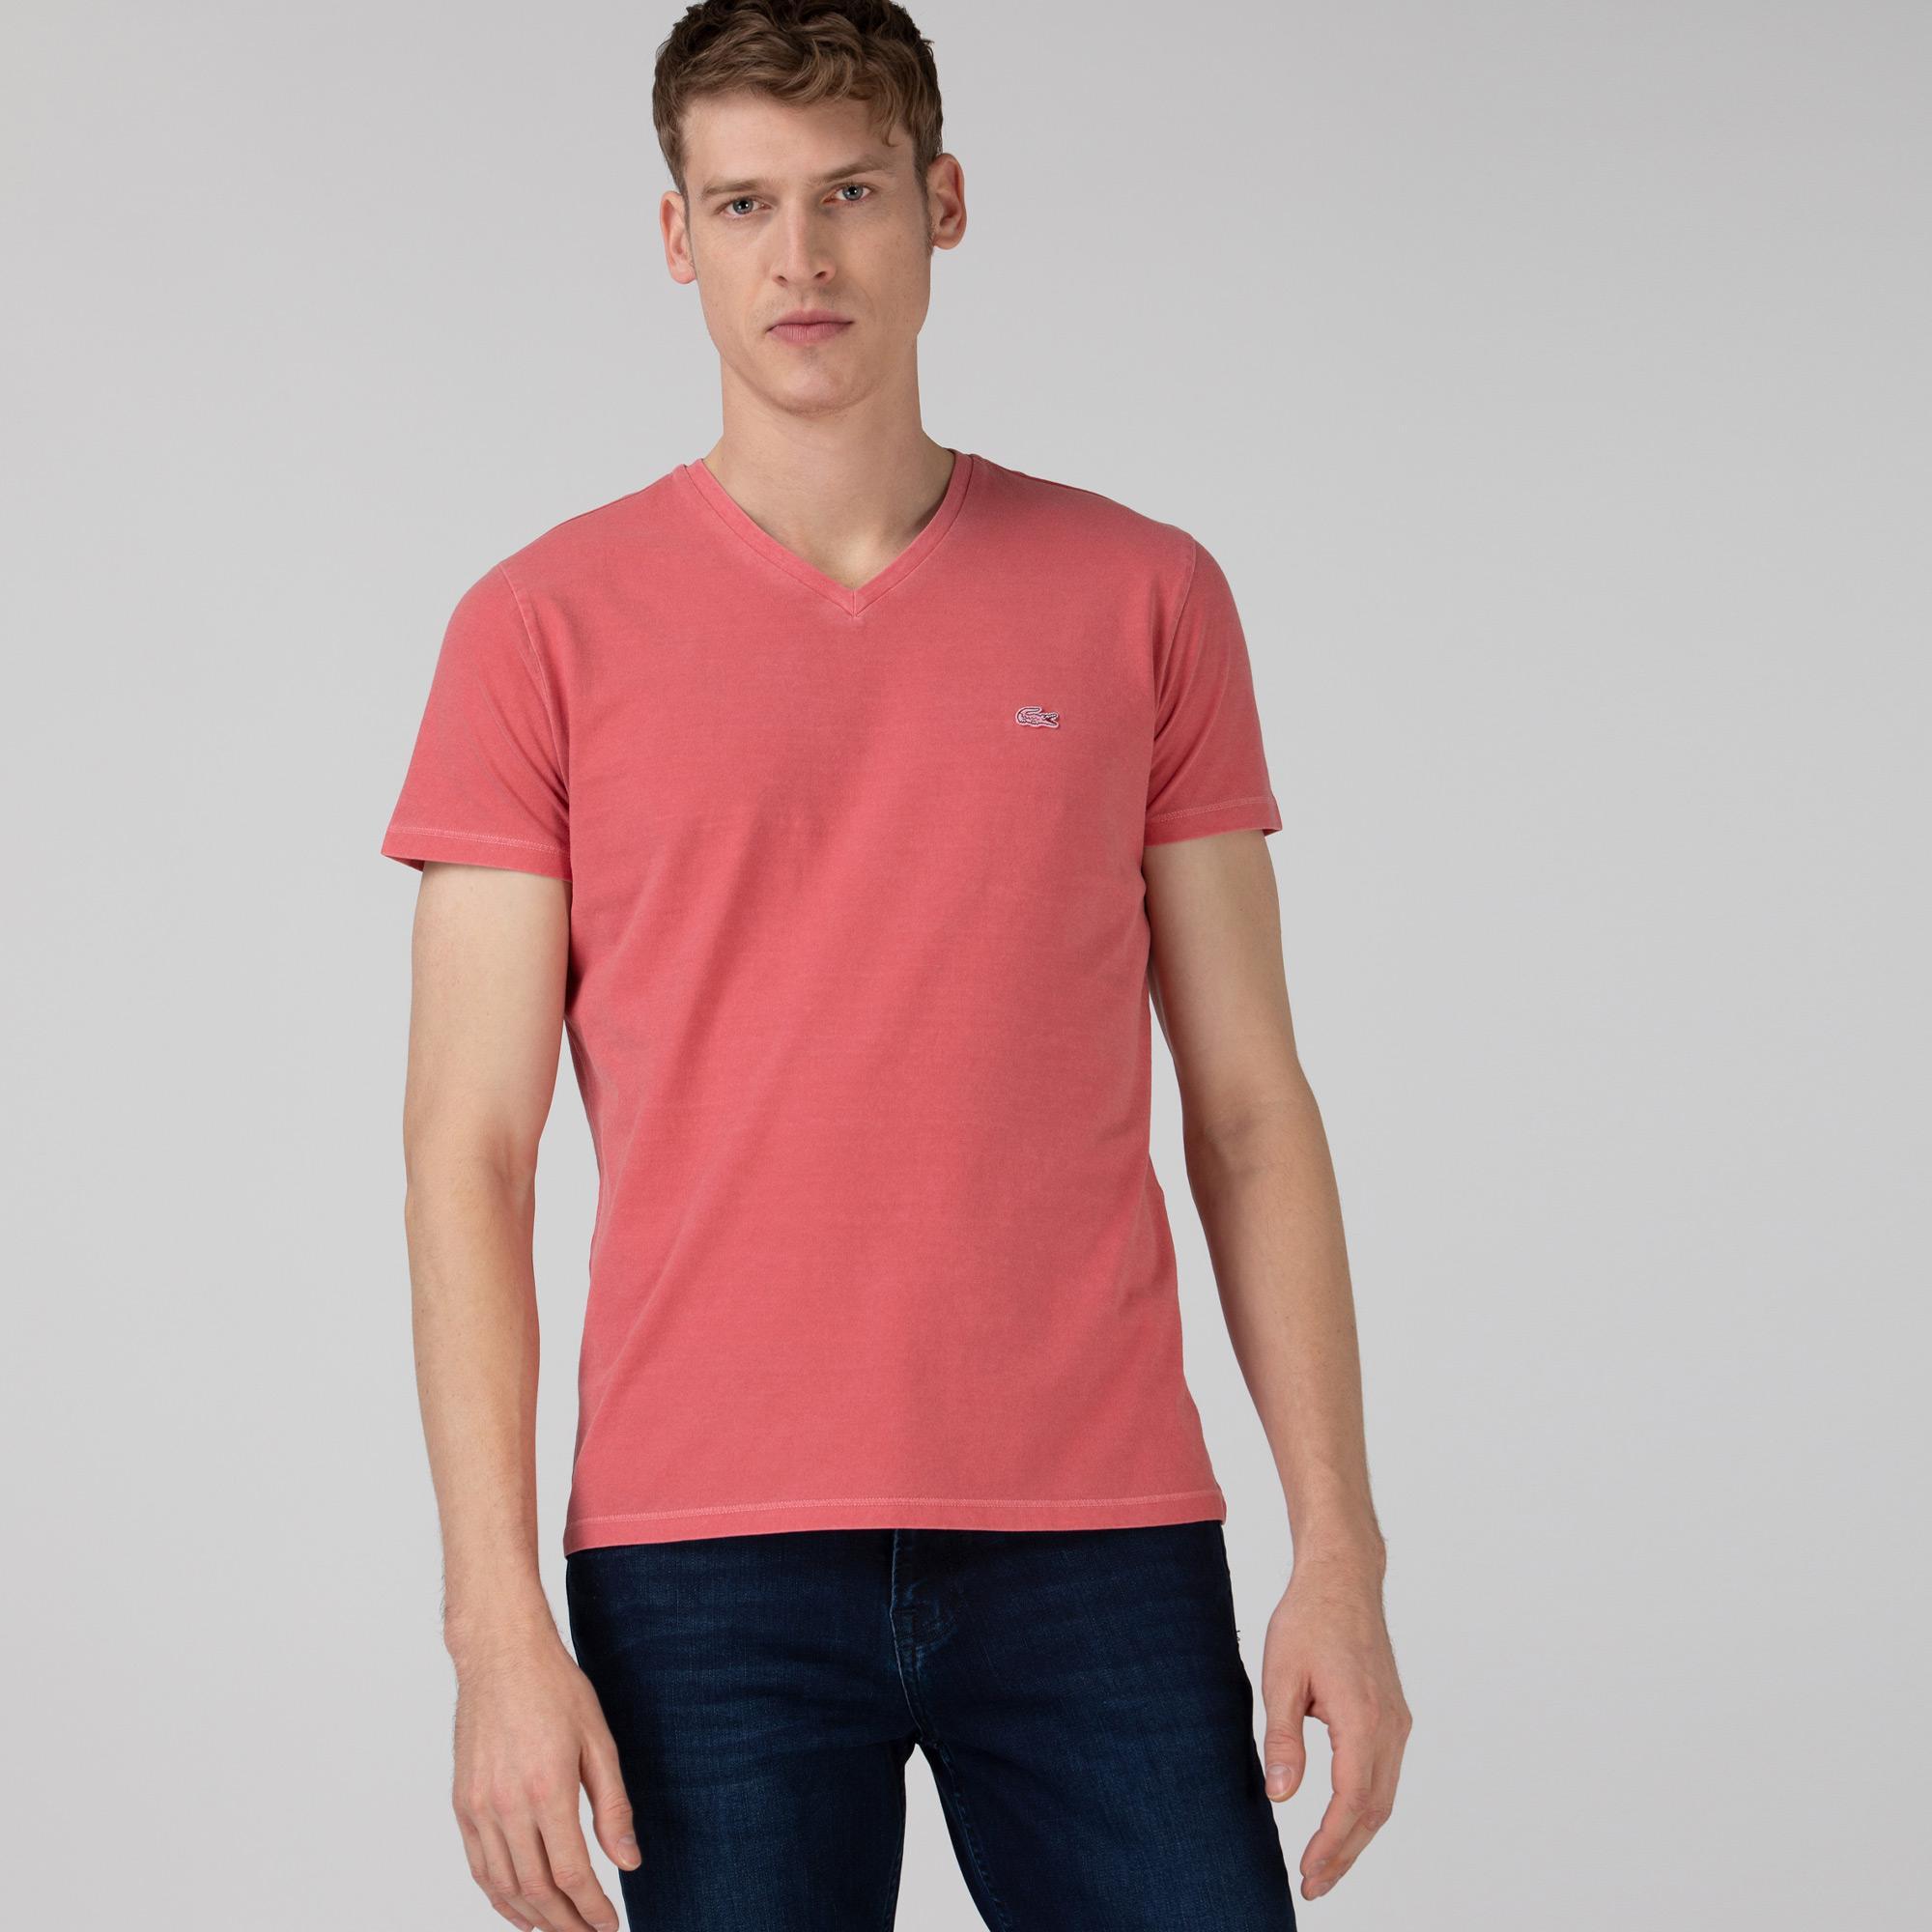 Lacoste Erkek Slim Fit V Yaka Pembe T-Shirt